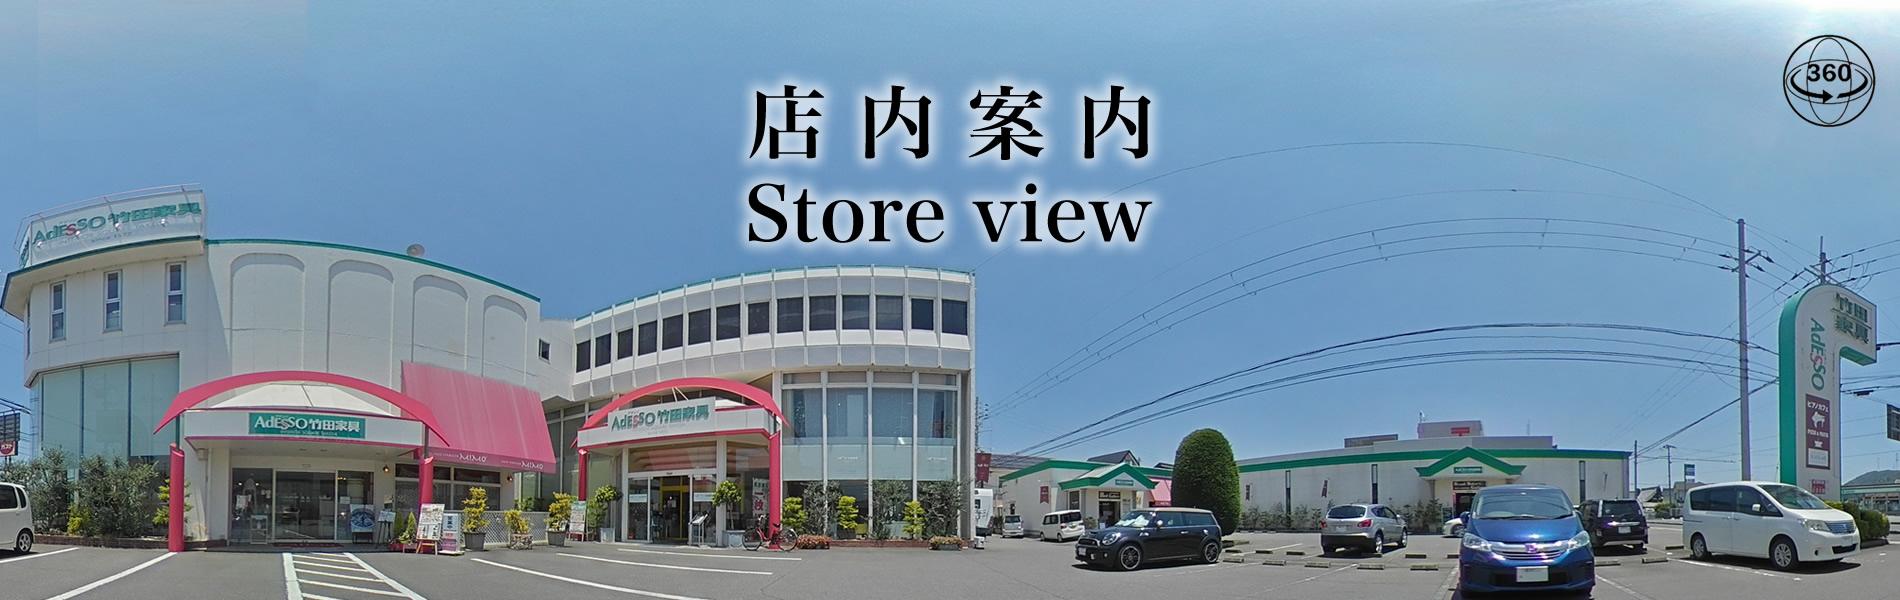 Store view 店内案内